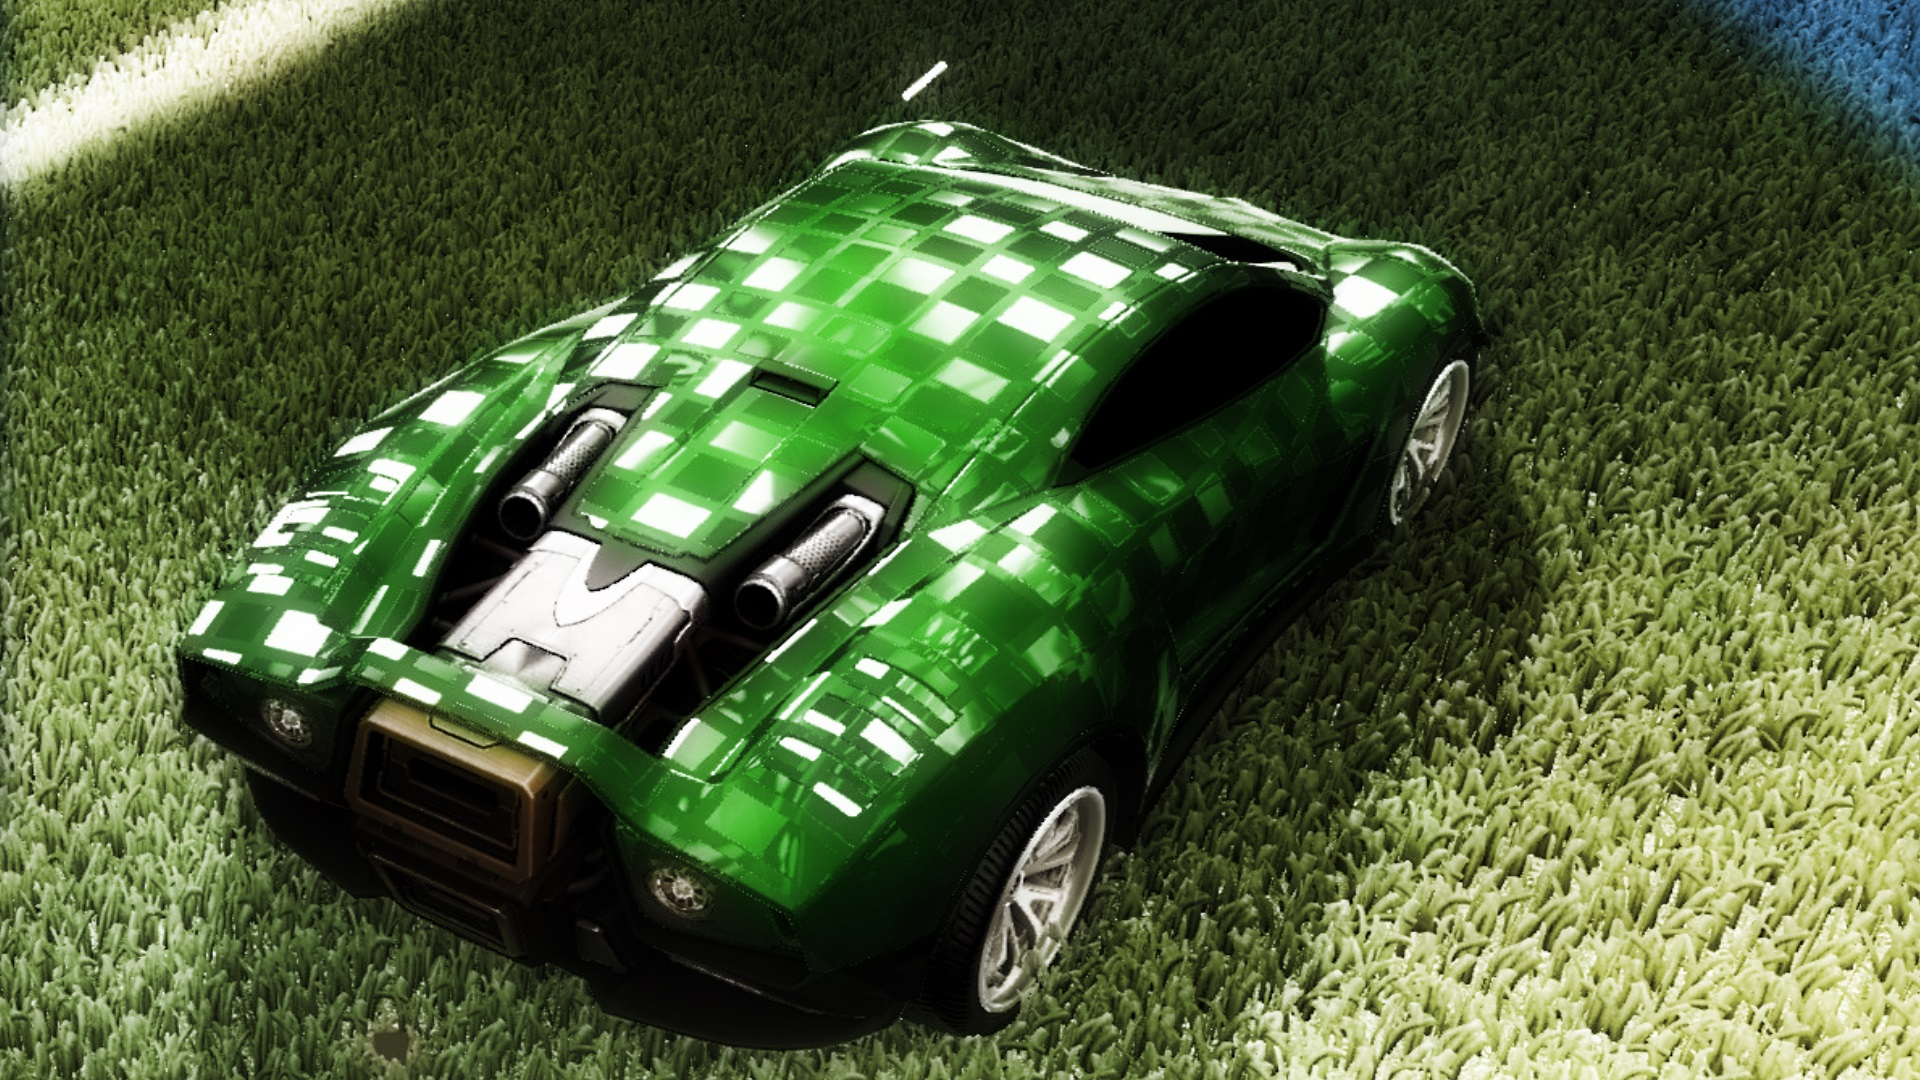 3 new Car Paints (Pixel, Crystal, Stone)